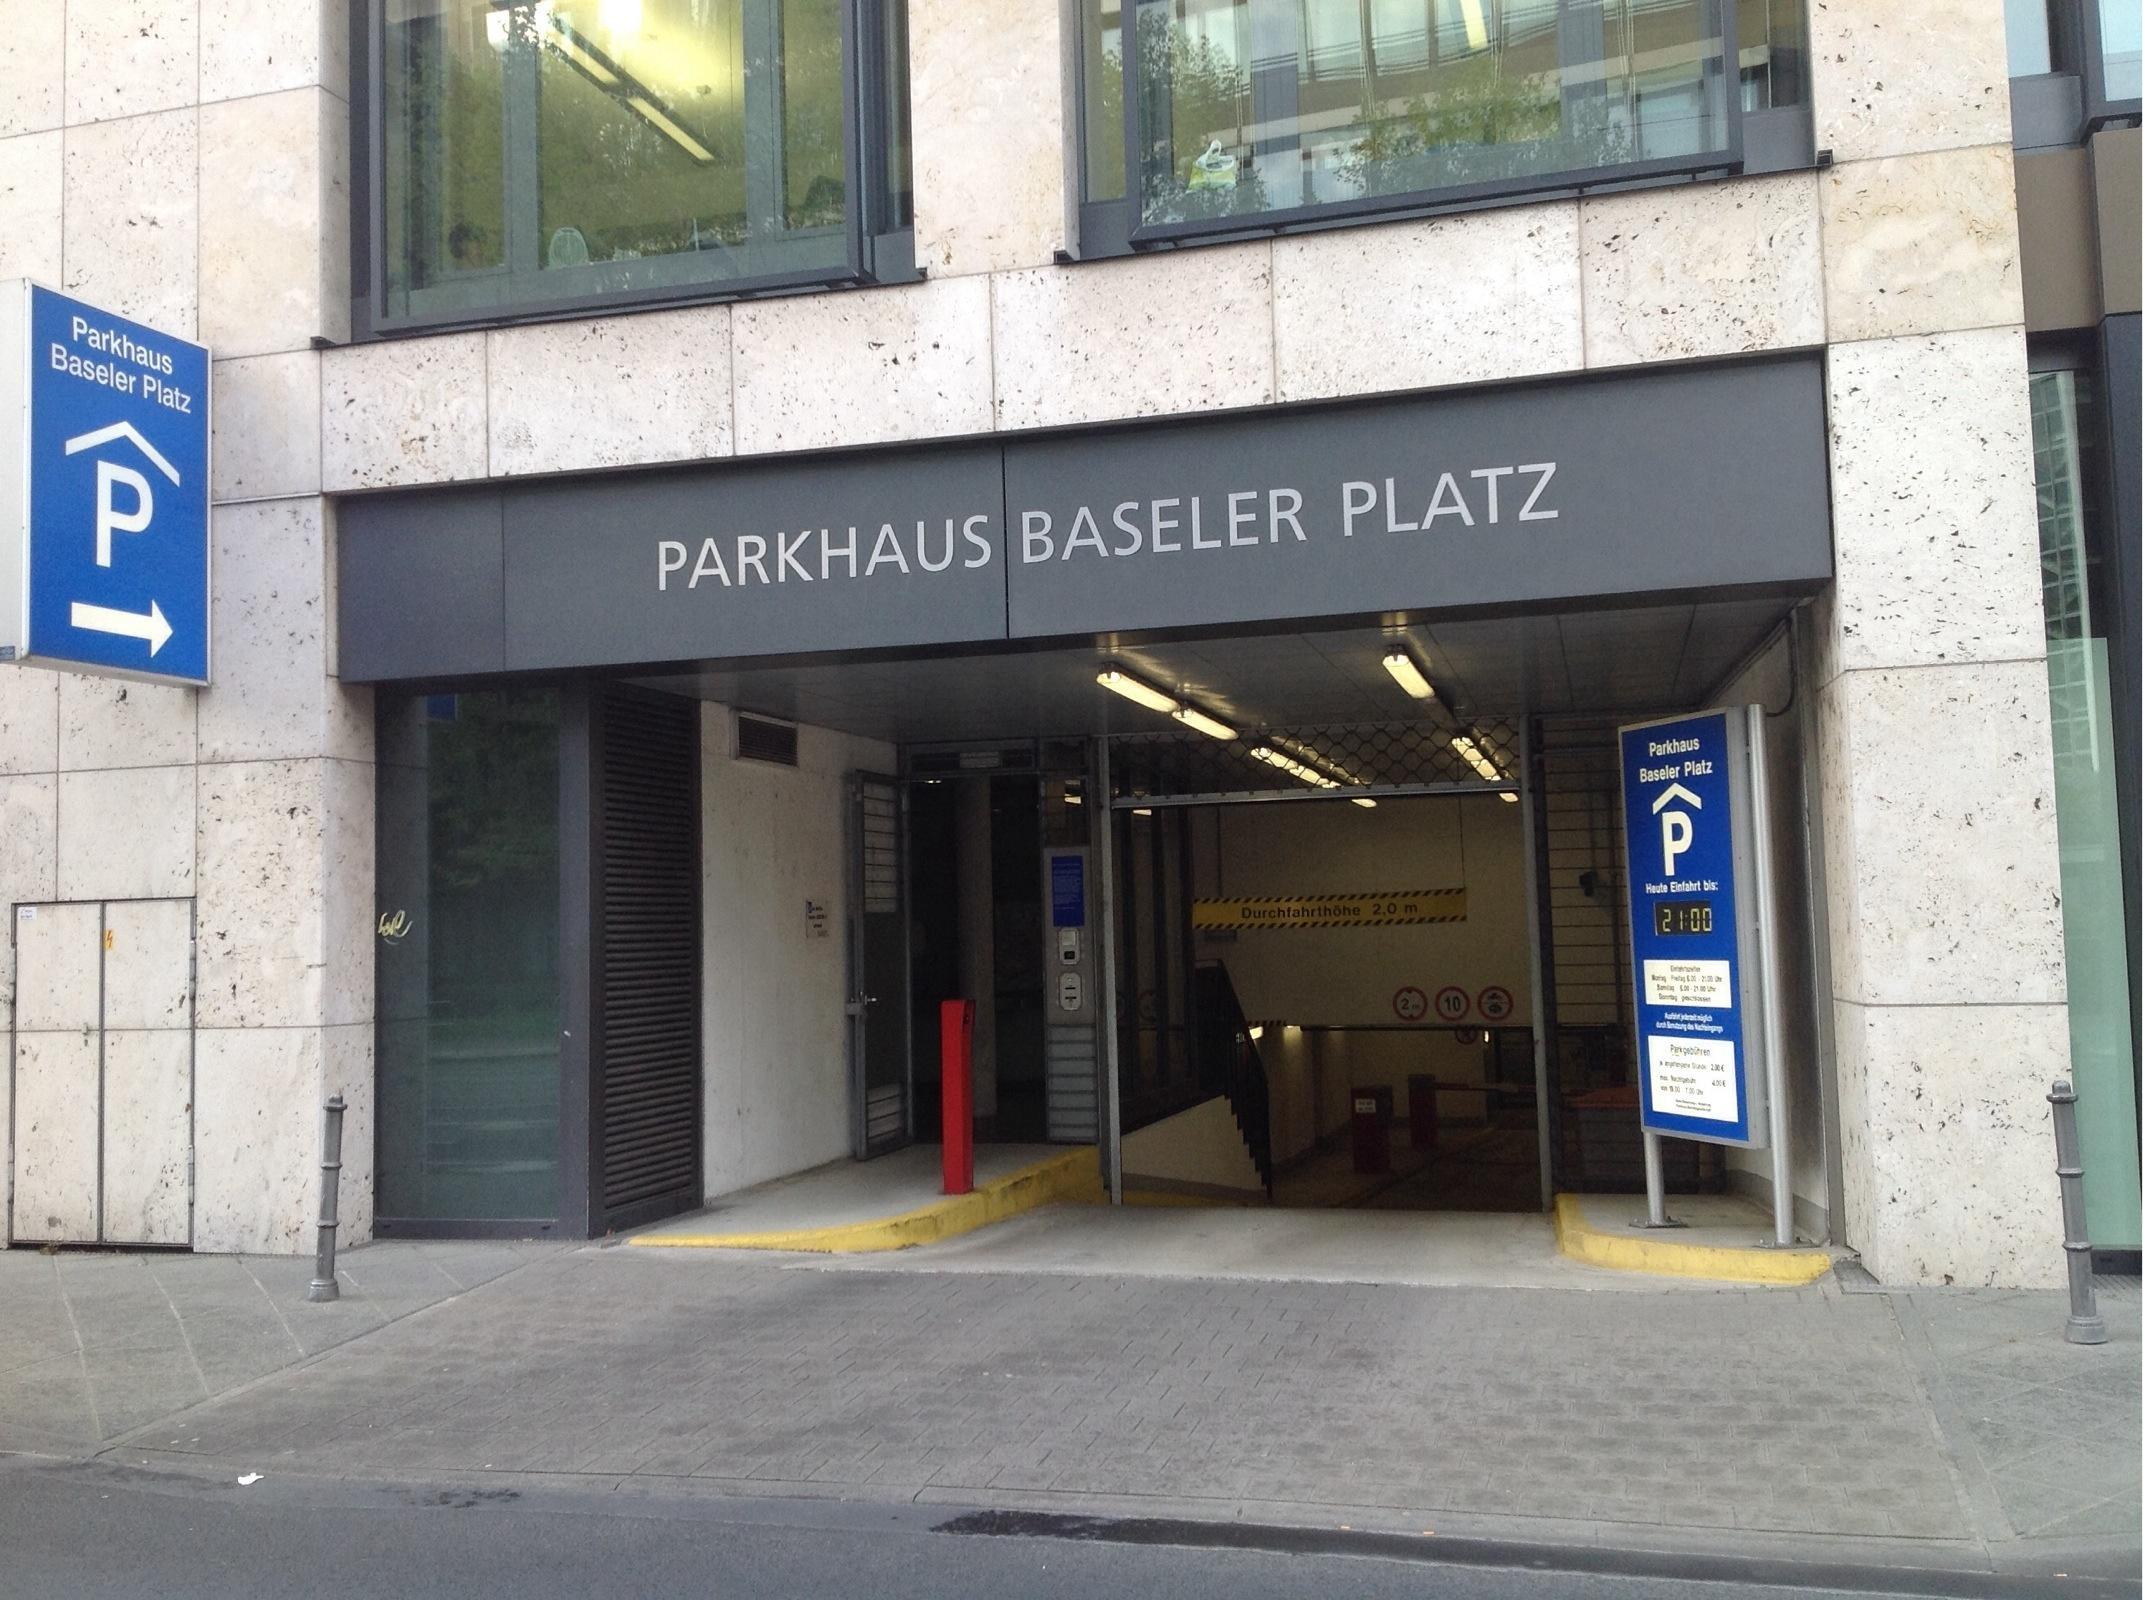 Parkhaus Baseler Platz